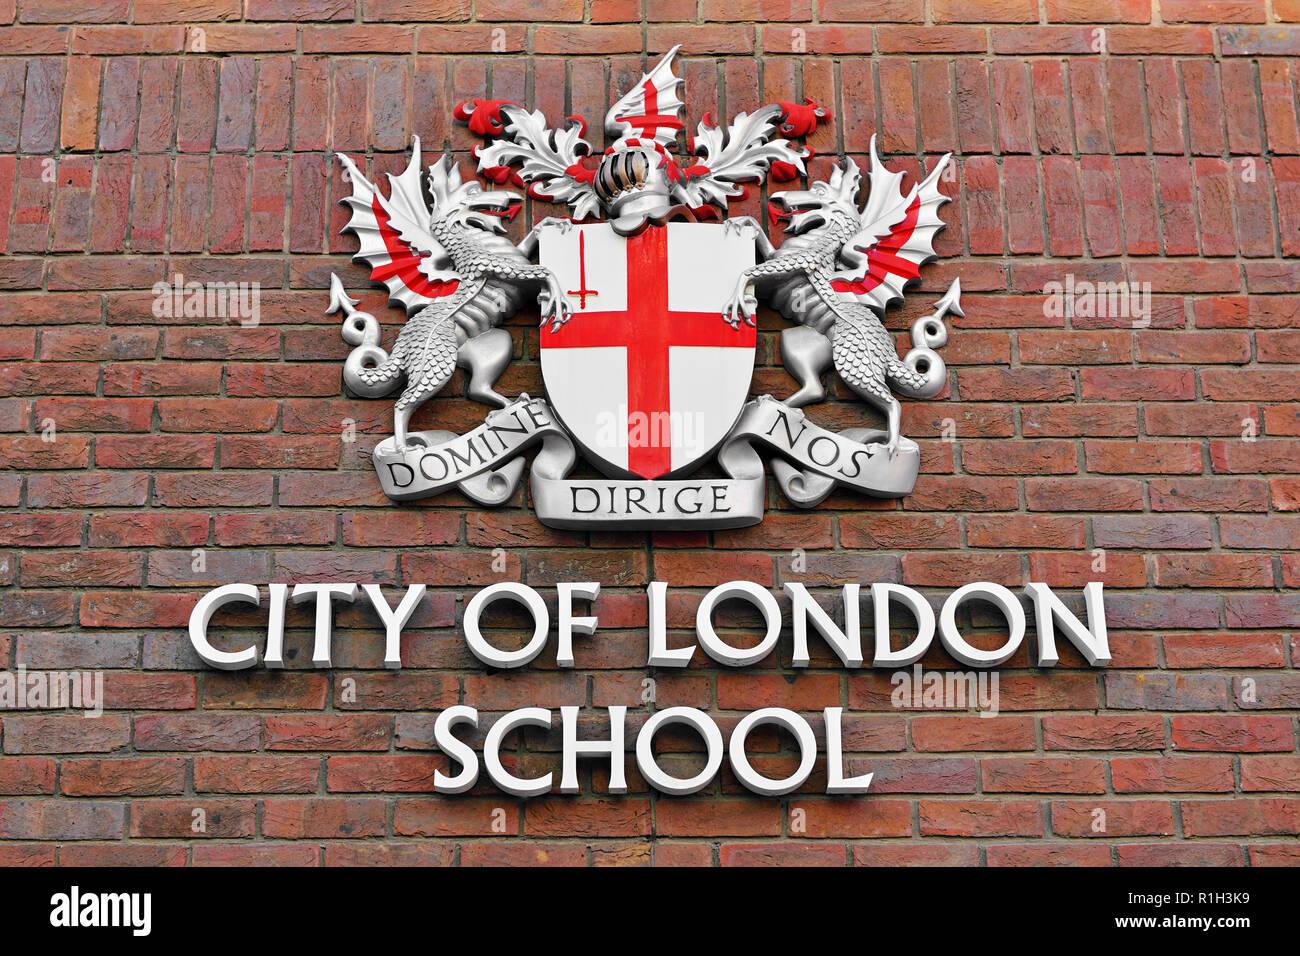 City of London School Sign, London, England, United Kingdom - Stock Image